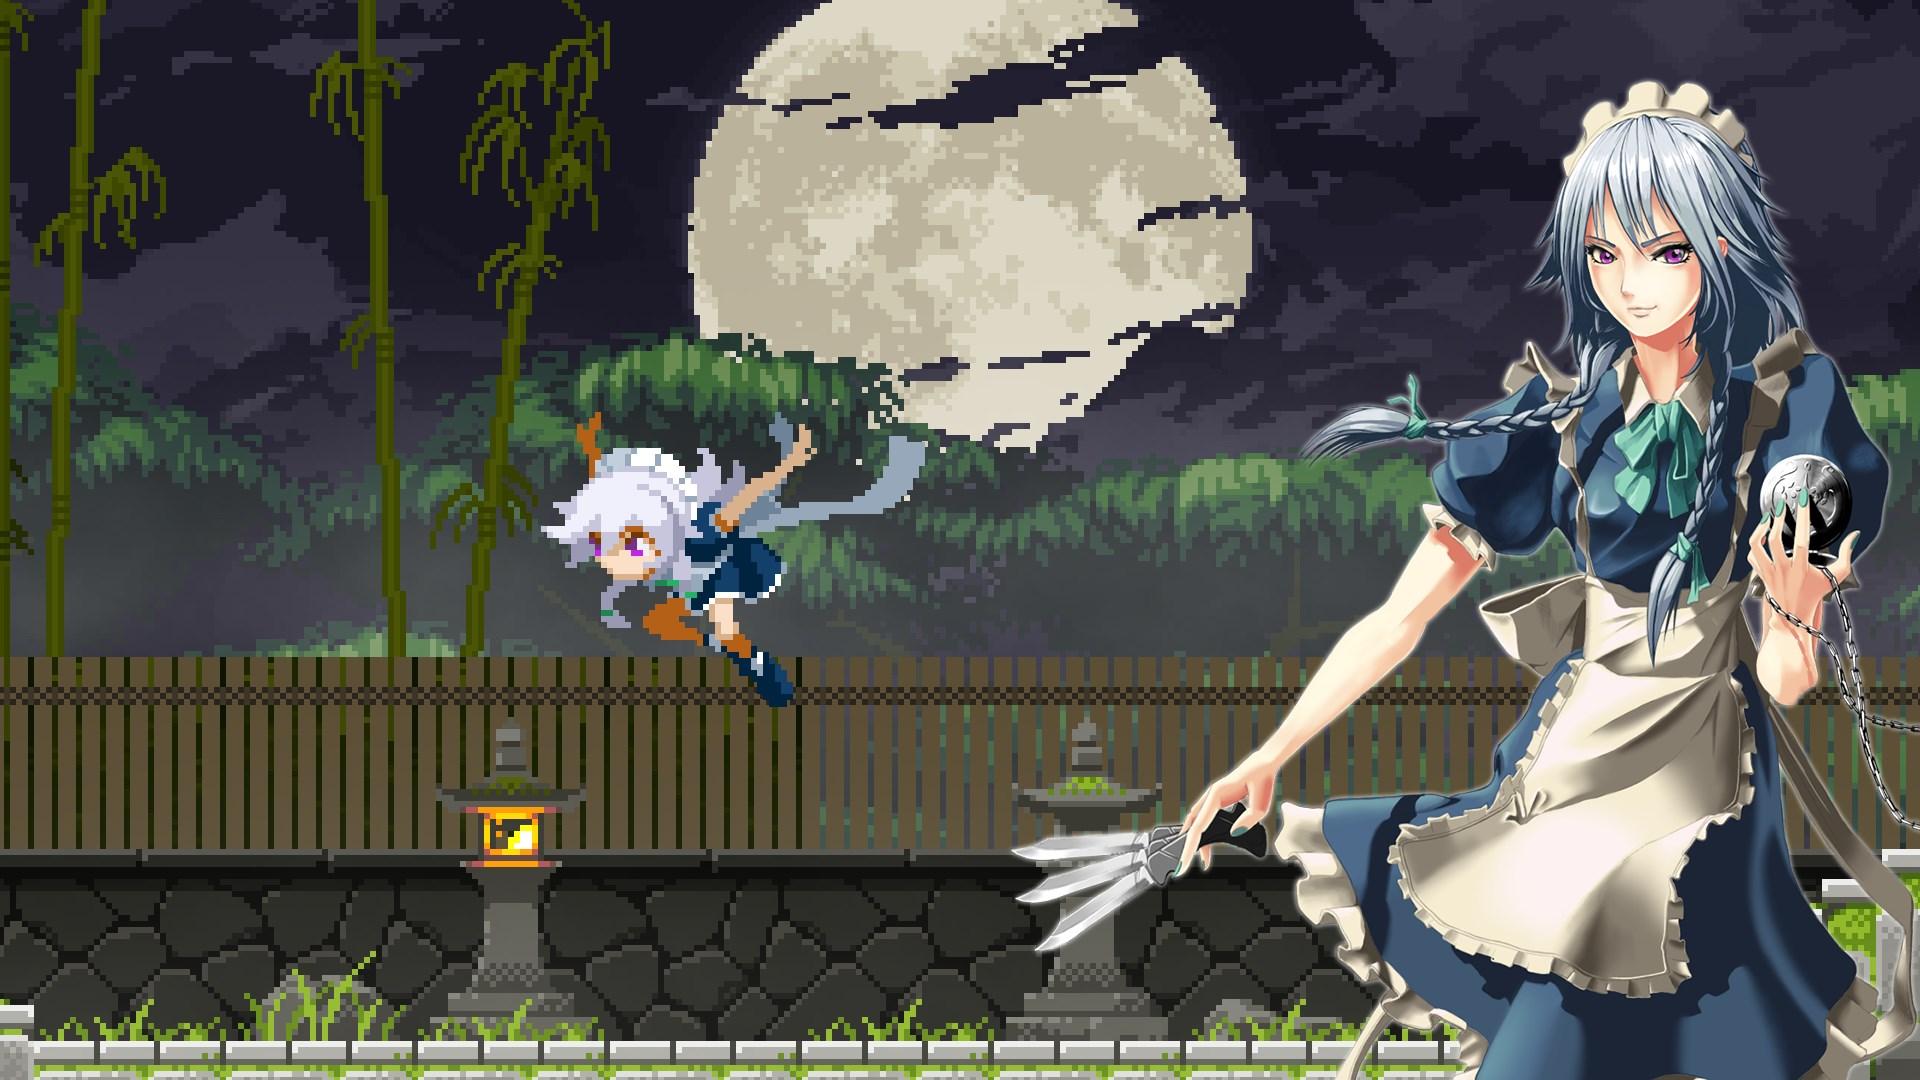 Touhou Luna Night